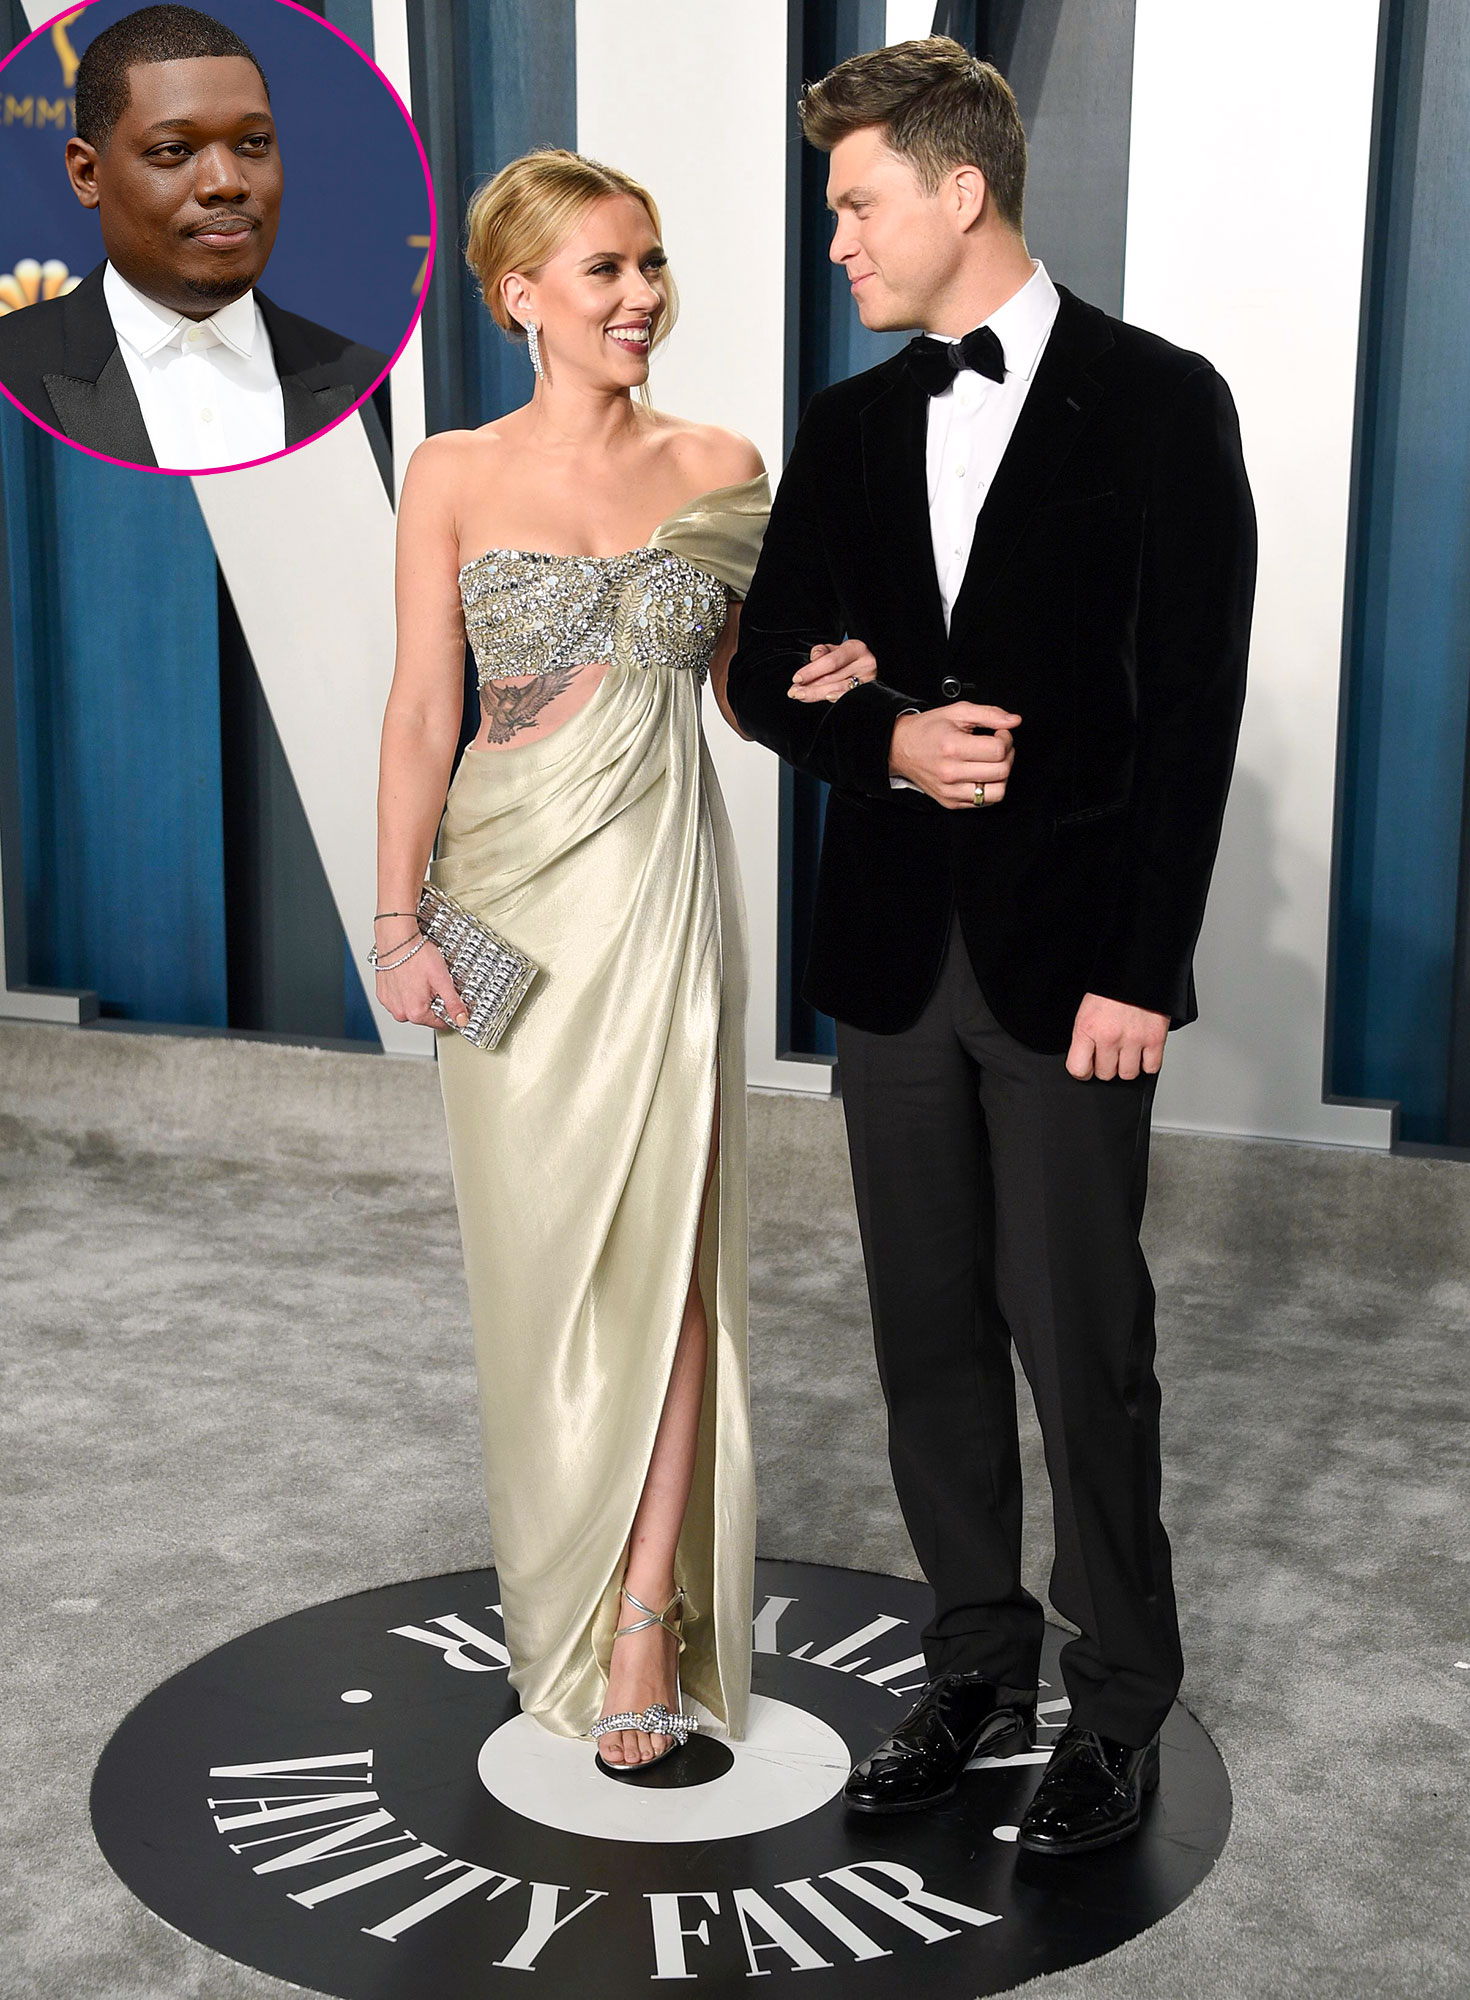 Michael Che Dishes On Colin Jost S Wedding To Scarlett Johansson